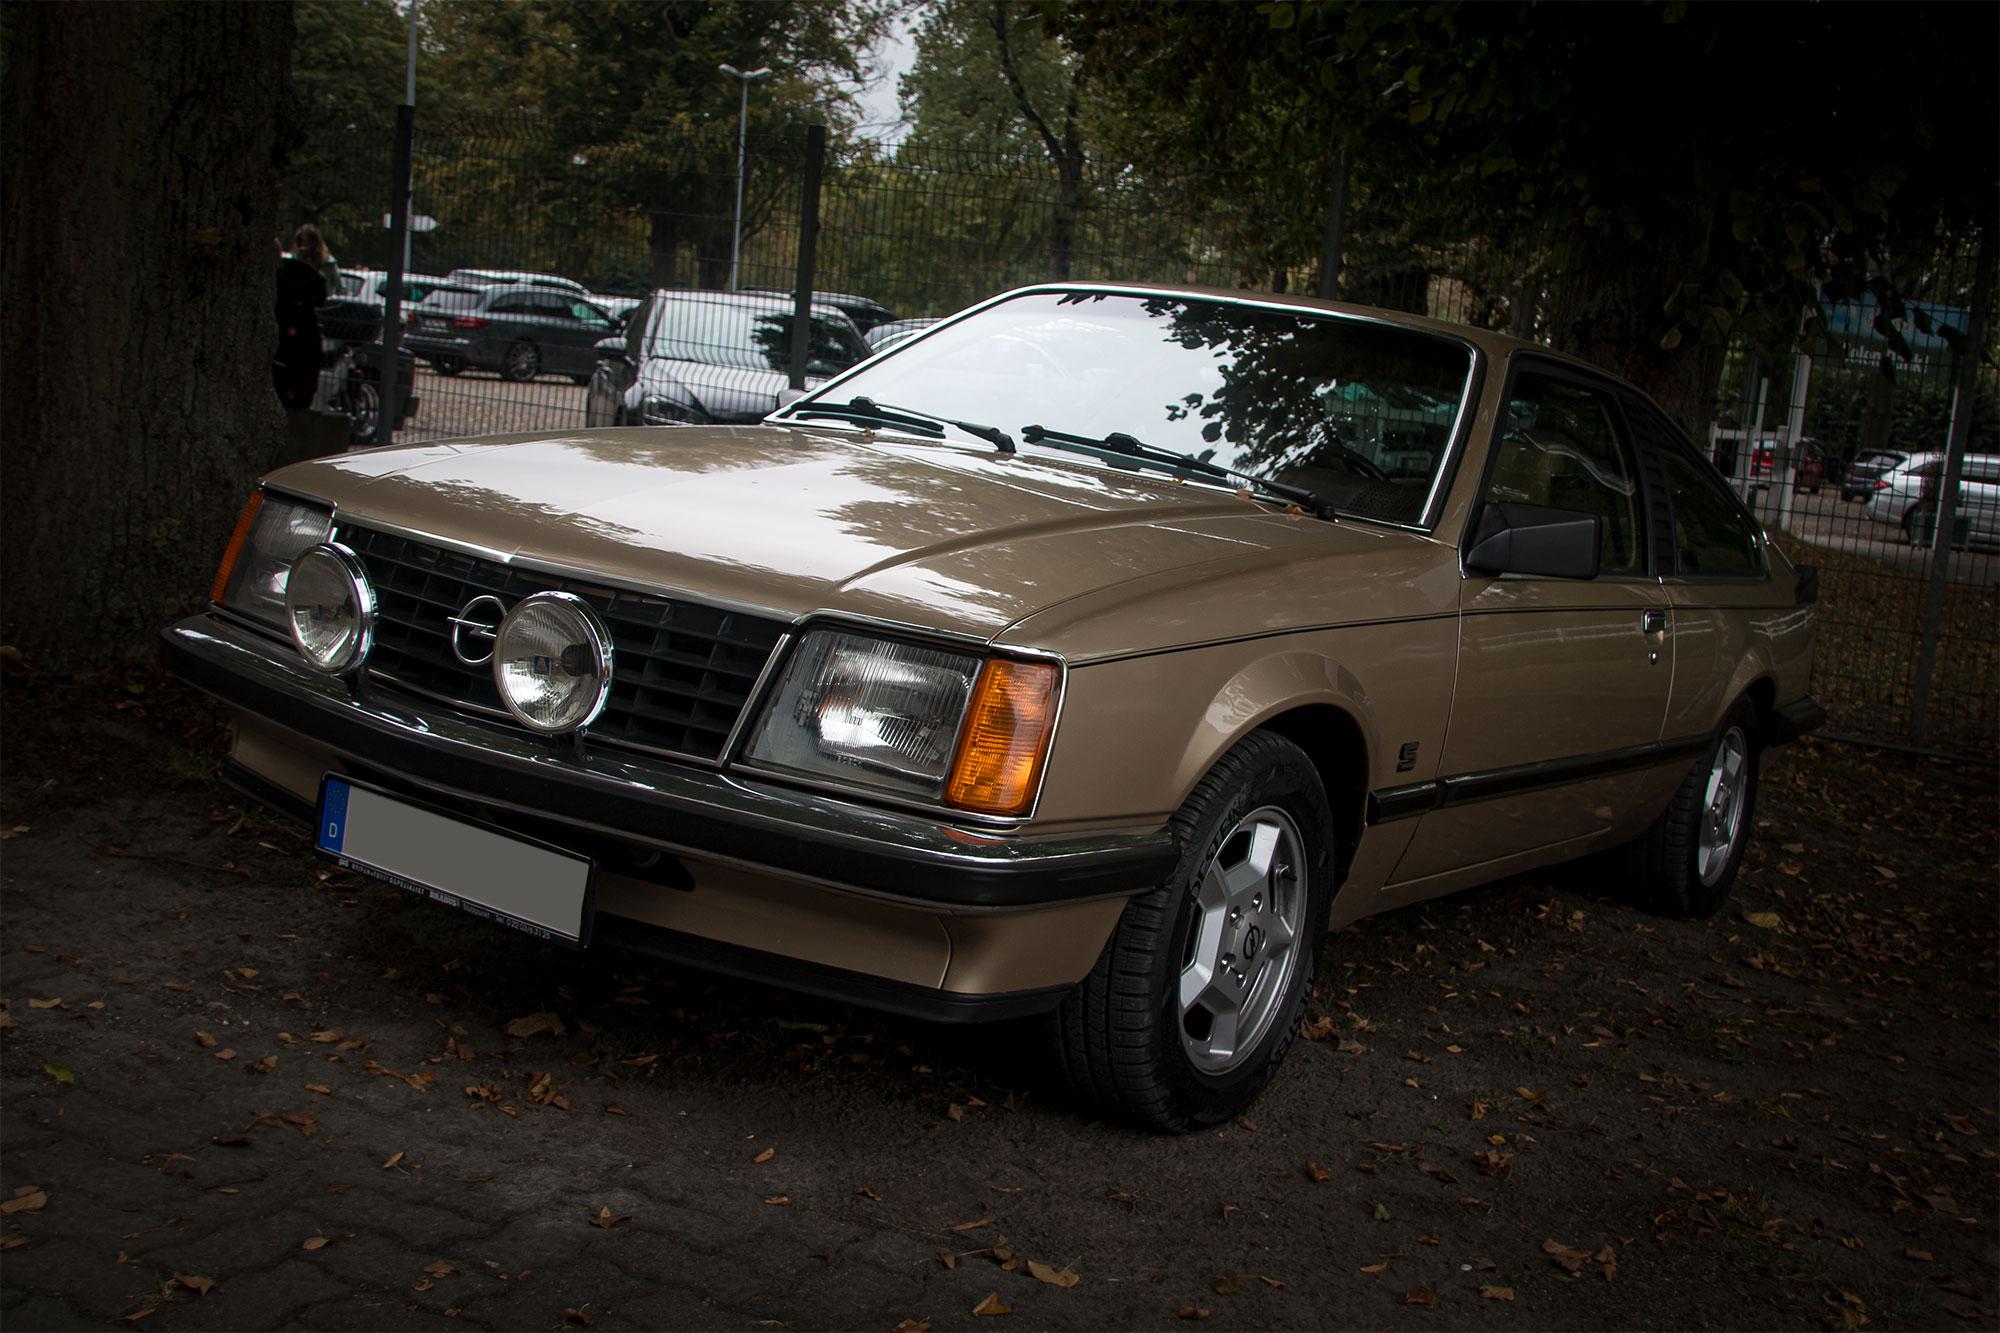 Opel Monza - Oldtimer/Youngtimer Frühstück - Galopprennbahn Dortmund